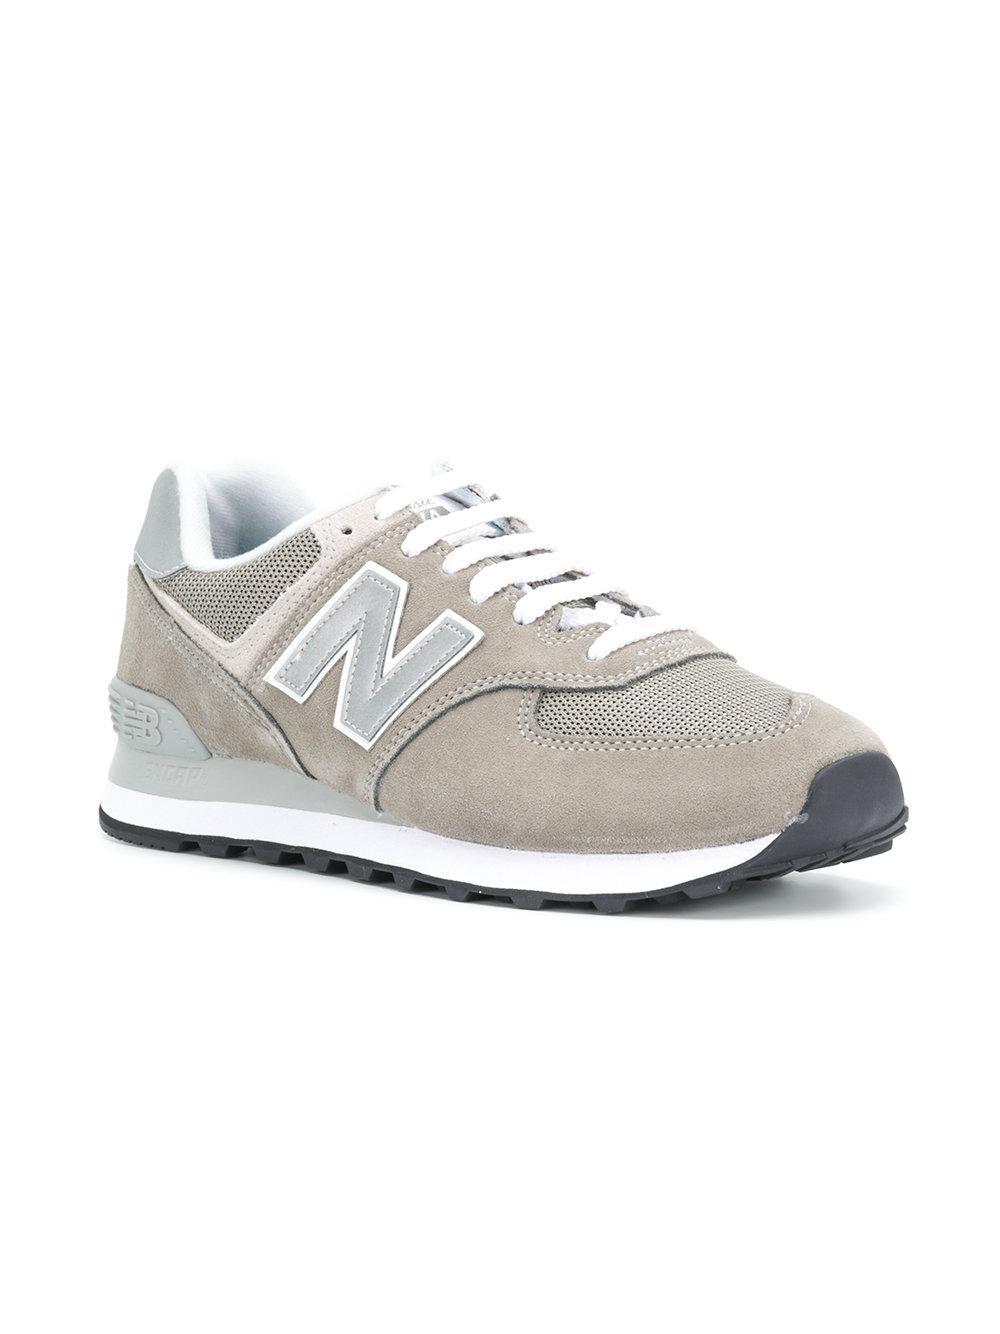 New Balance - Gray 574 Sneakers for Men - Lyst. View fullscreen 3bbaea9b2